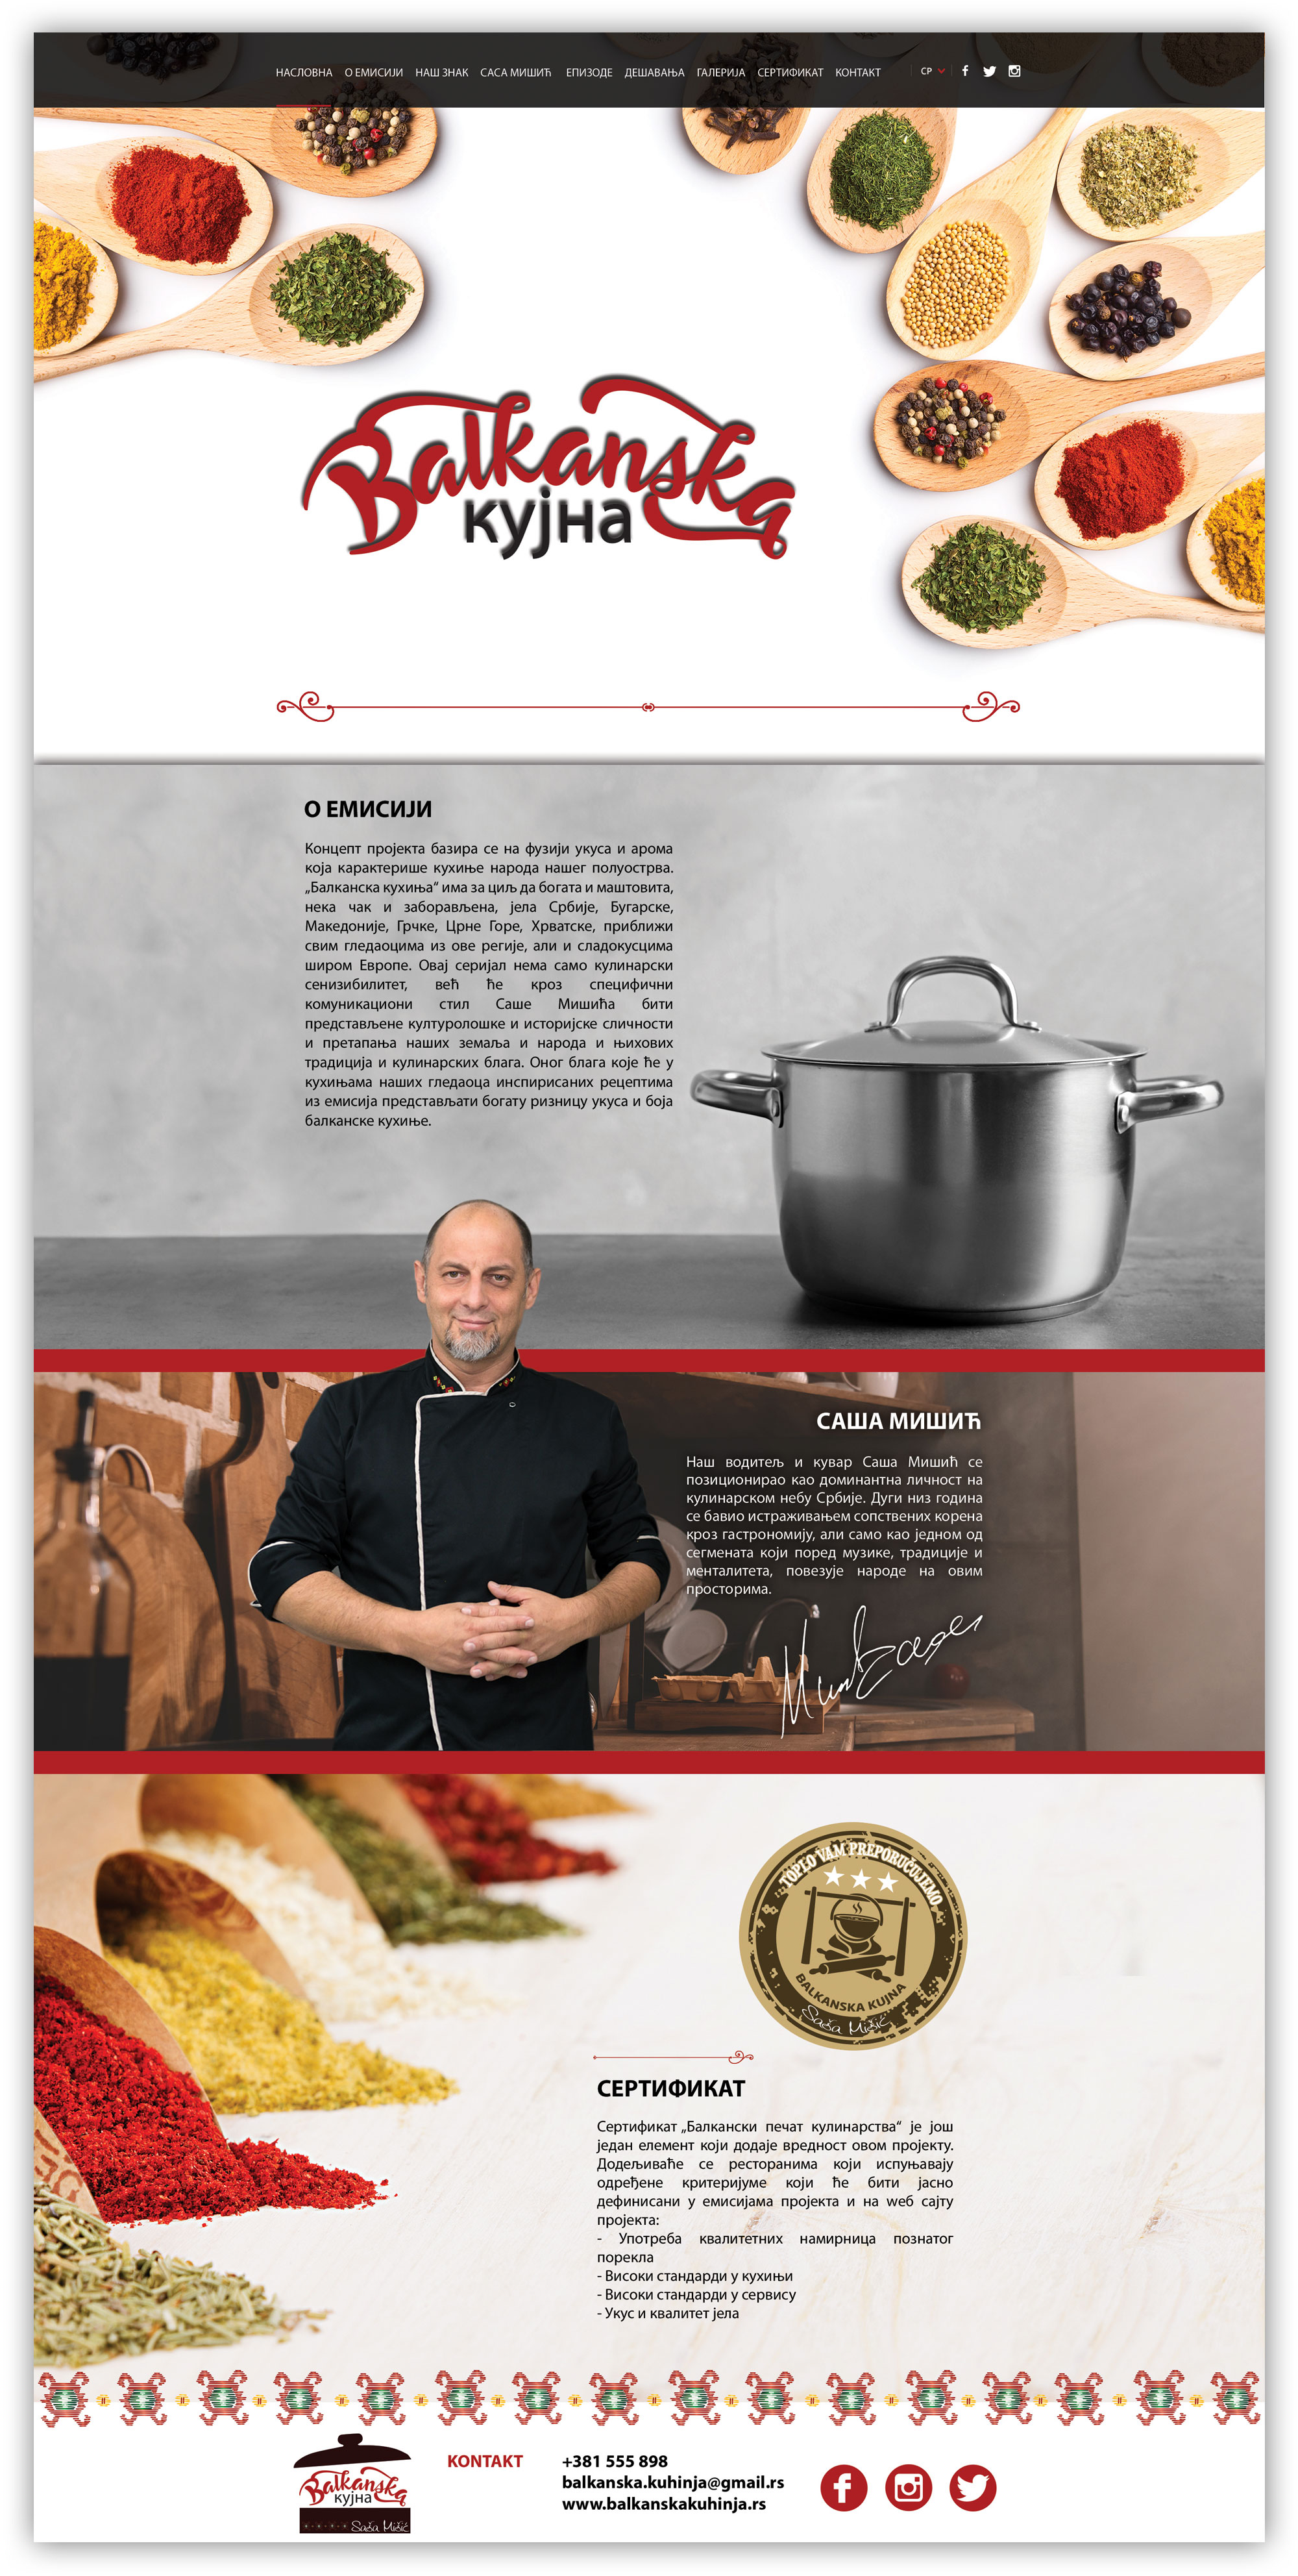 balkanska kujna website design